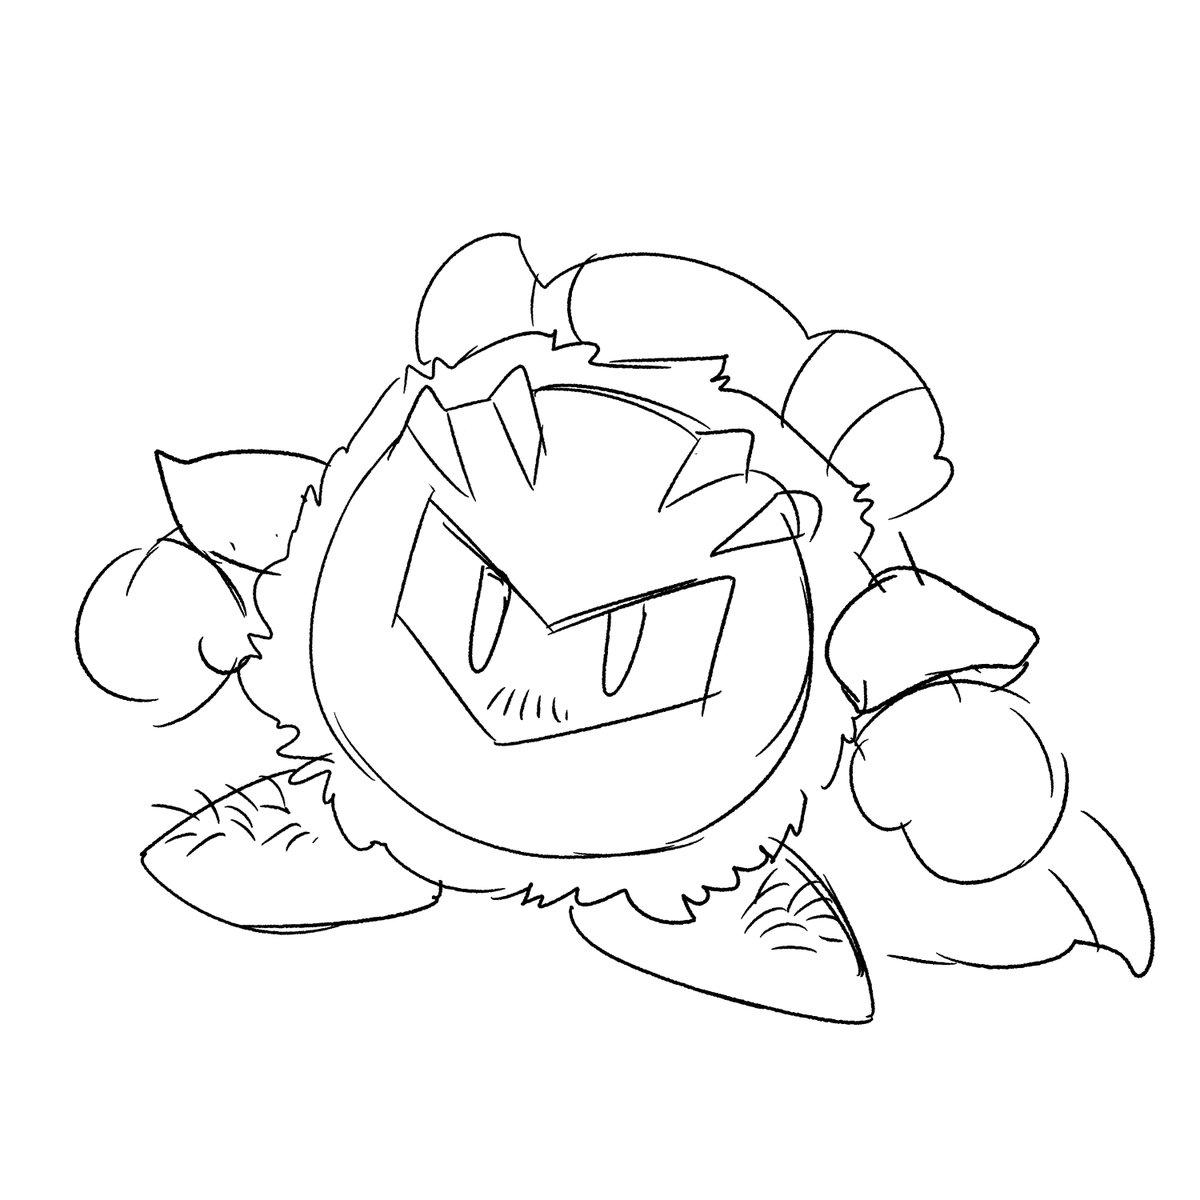 Coloriage Luigi Coloriage Mario Bros Yoshi Elégant Ausmalbilder